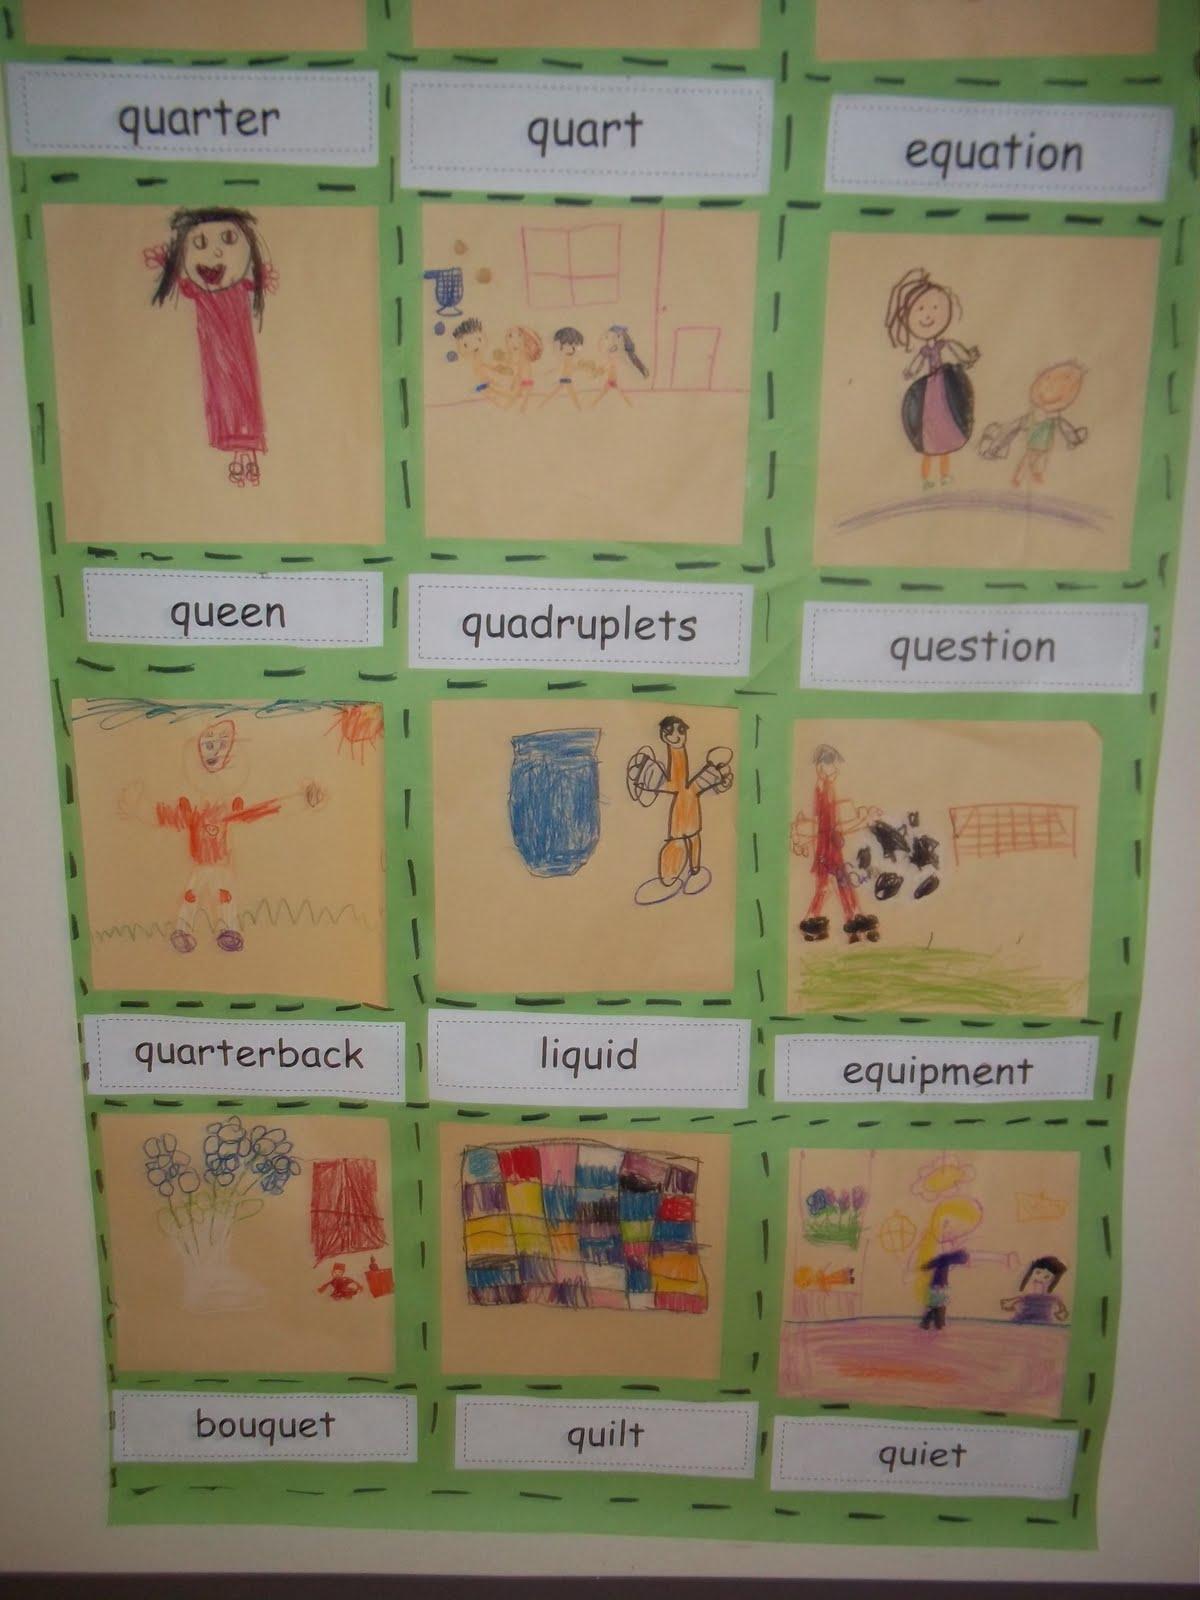 Letter Q Quilt Worksheet